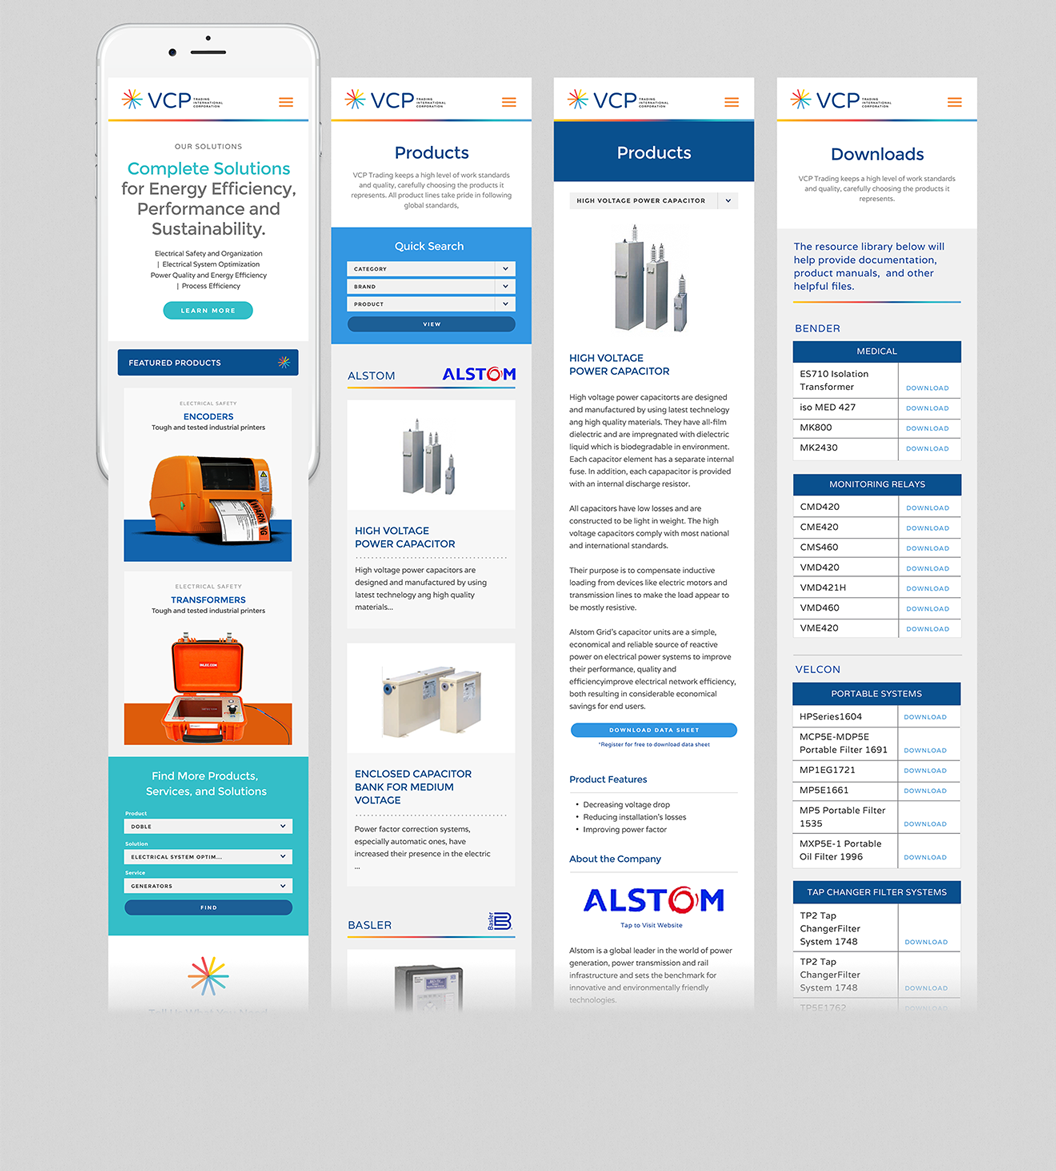 VCP, Branding, Identity, Design, Marc Ruiz, Corporate Identity, Trading, Solutions, Website Design, Graphic Design